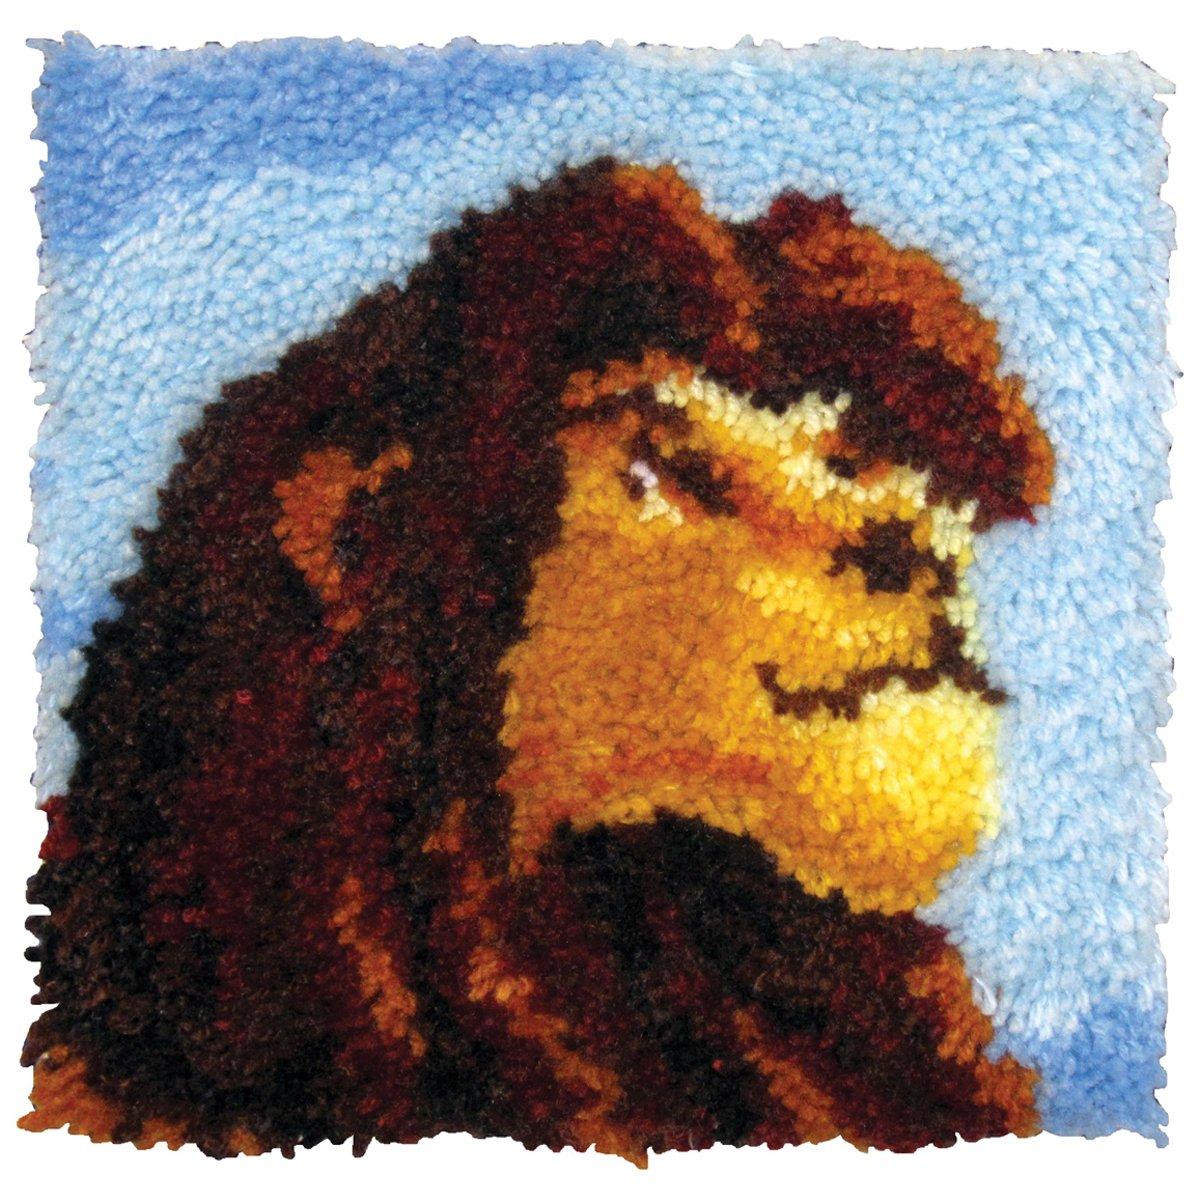 MCG Textiles 52760 Latch Hook The Lion King Disney Dreams Collection Kit by Thomas Kinkade for Pillows